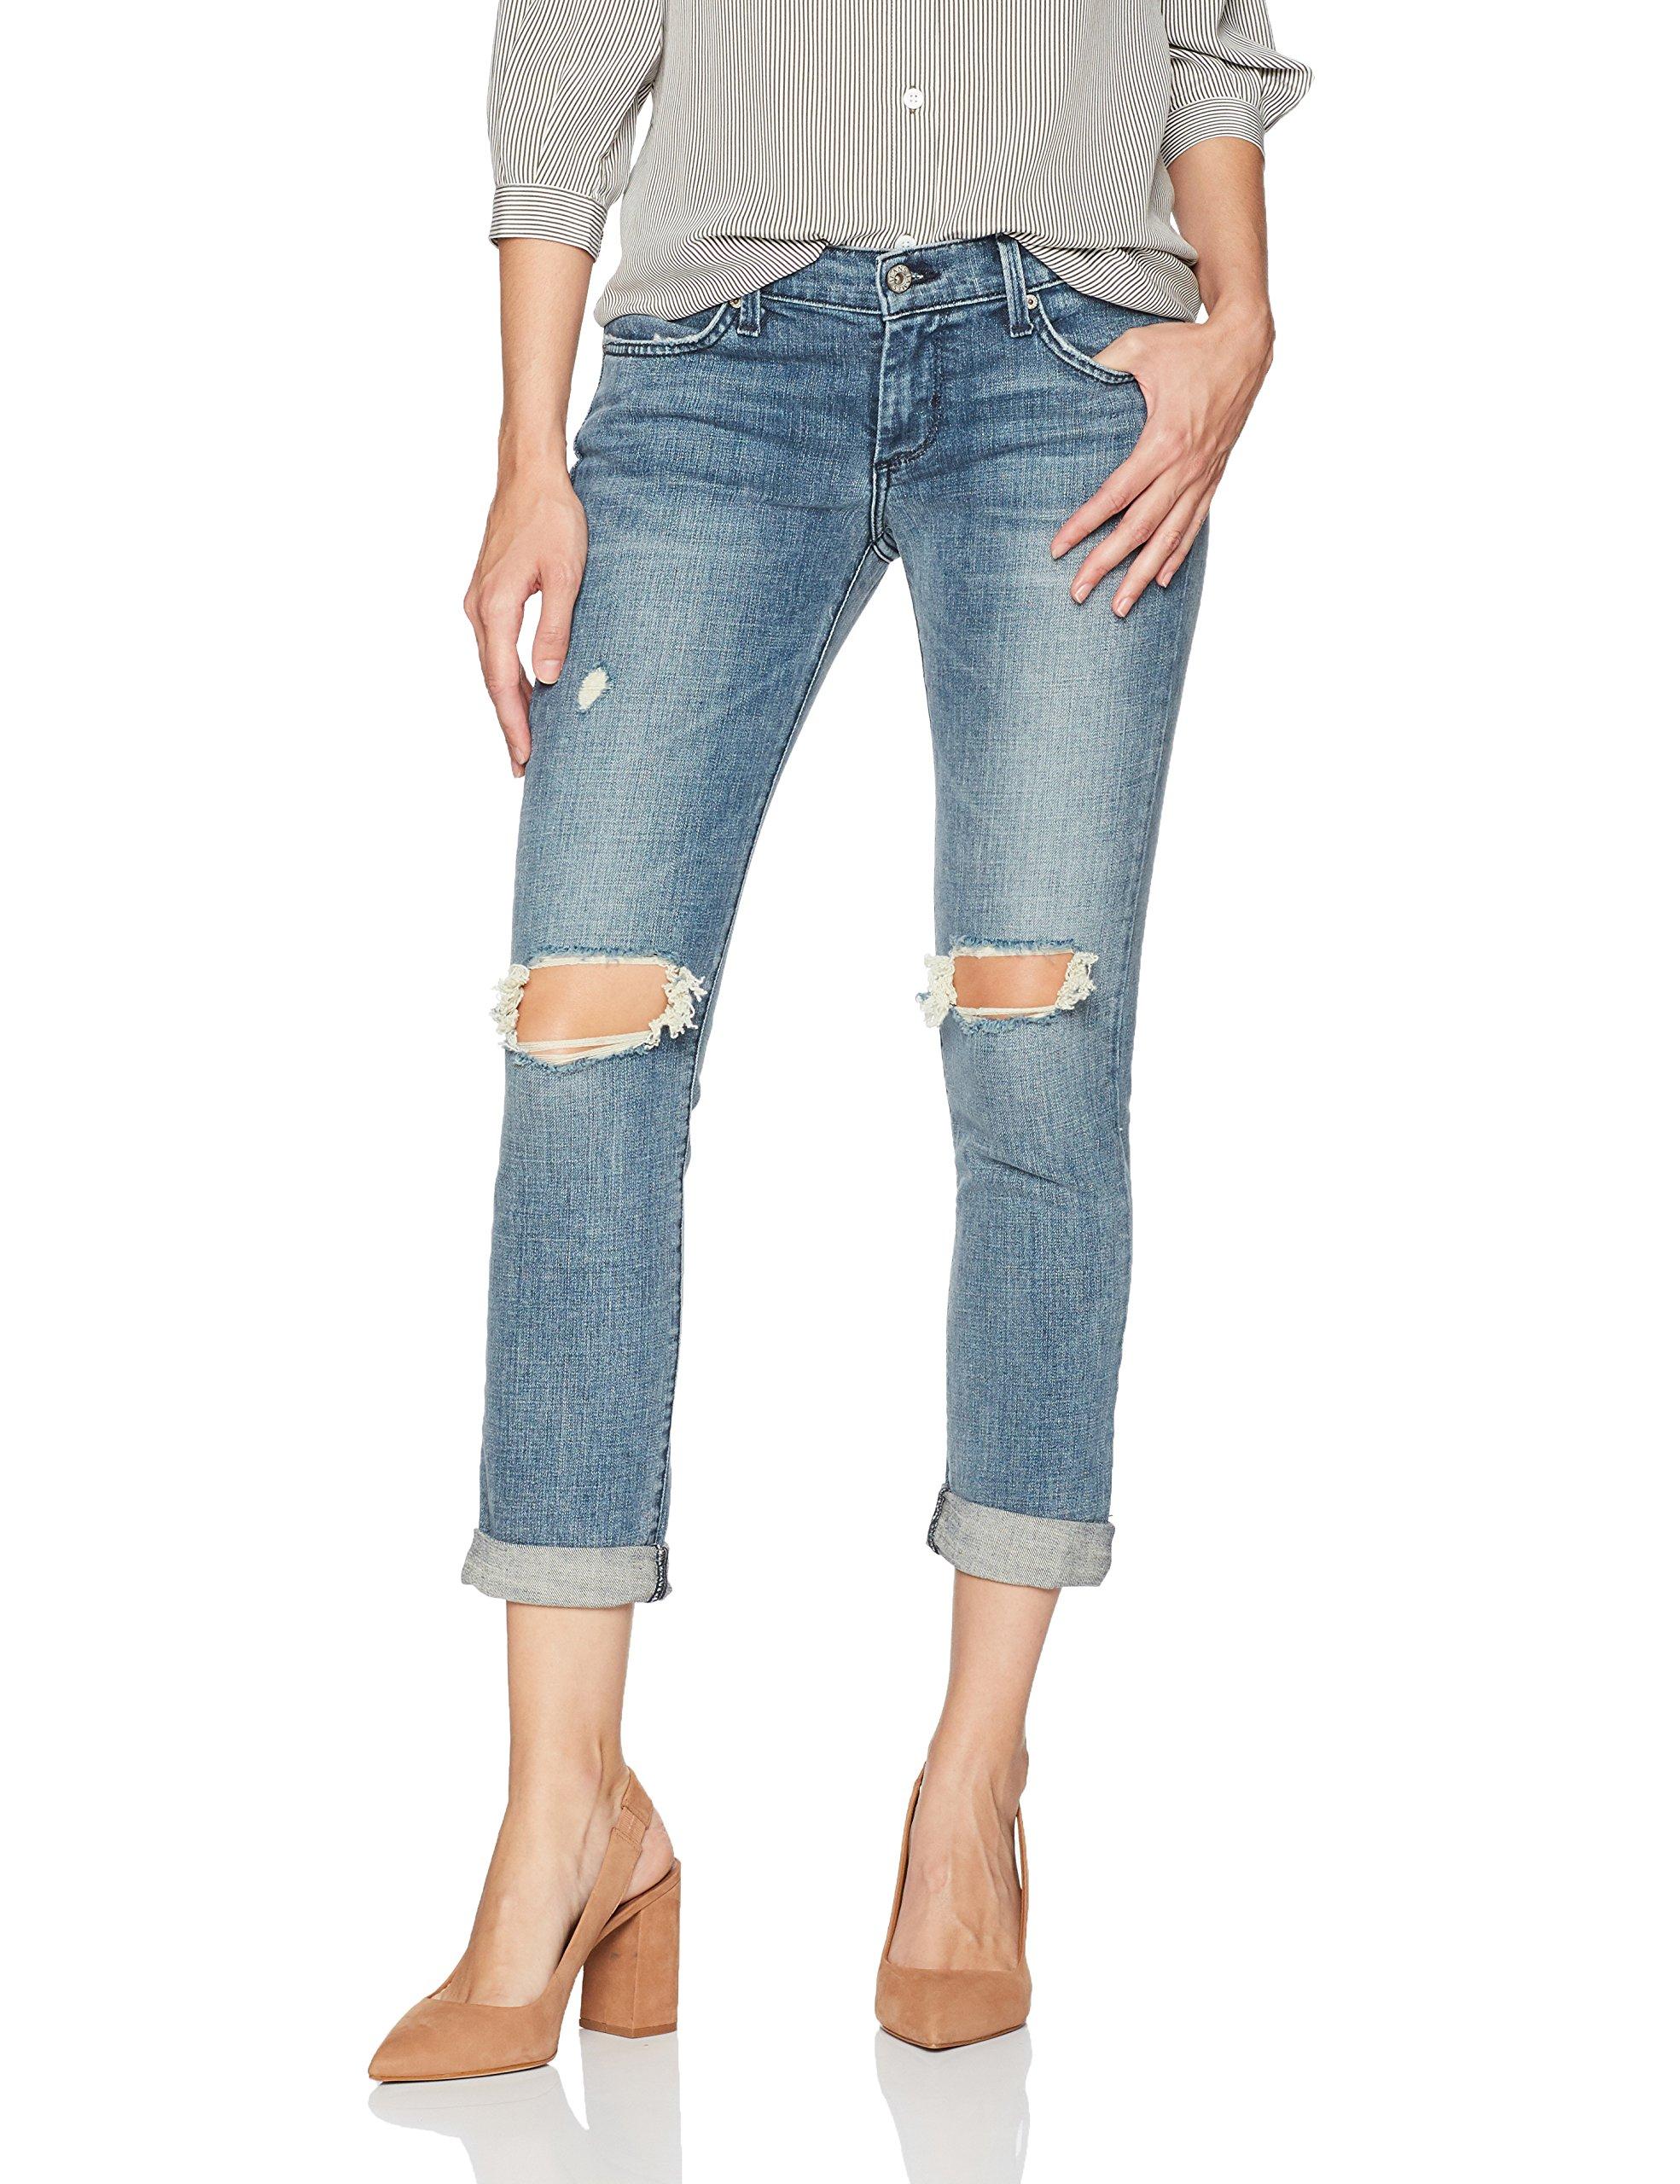 Buy Authentic discount price big discount of 2019 James Jeans Women's Neo Beau Girlfriend Jean, Heritage, 25